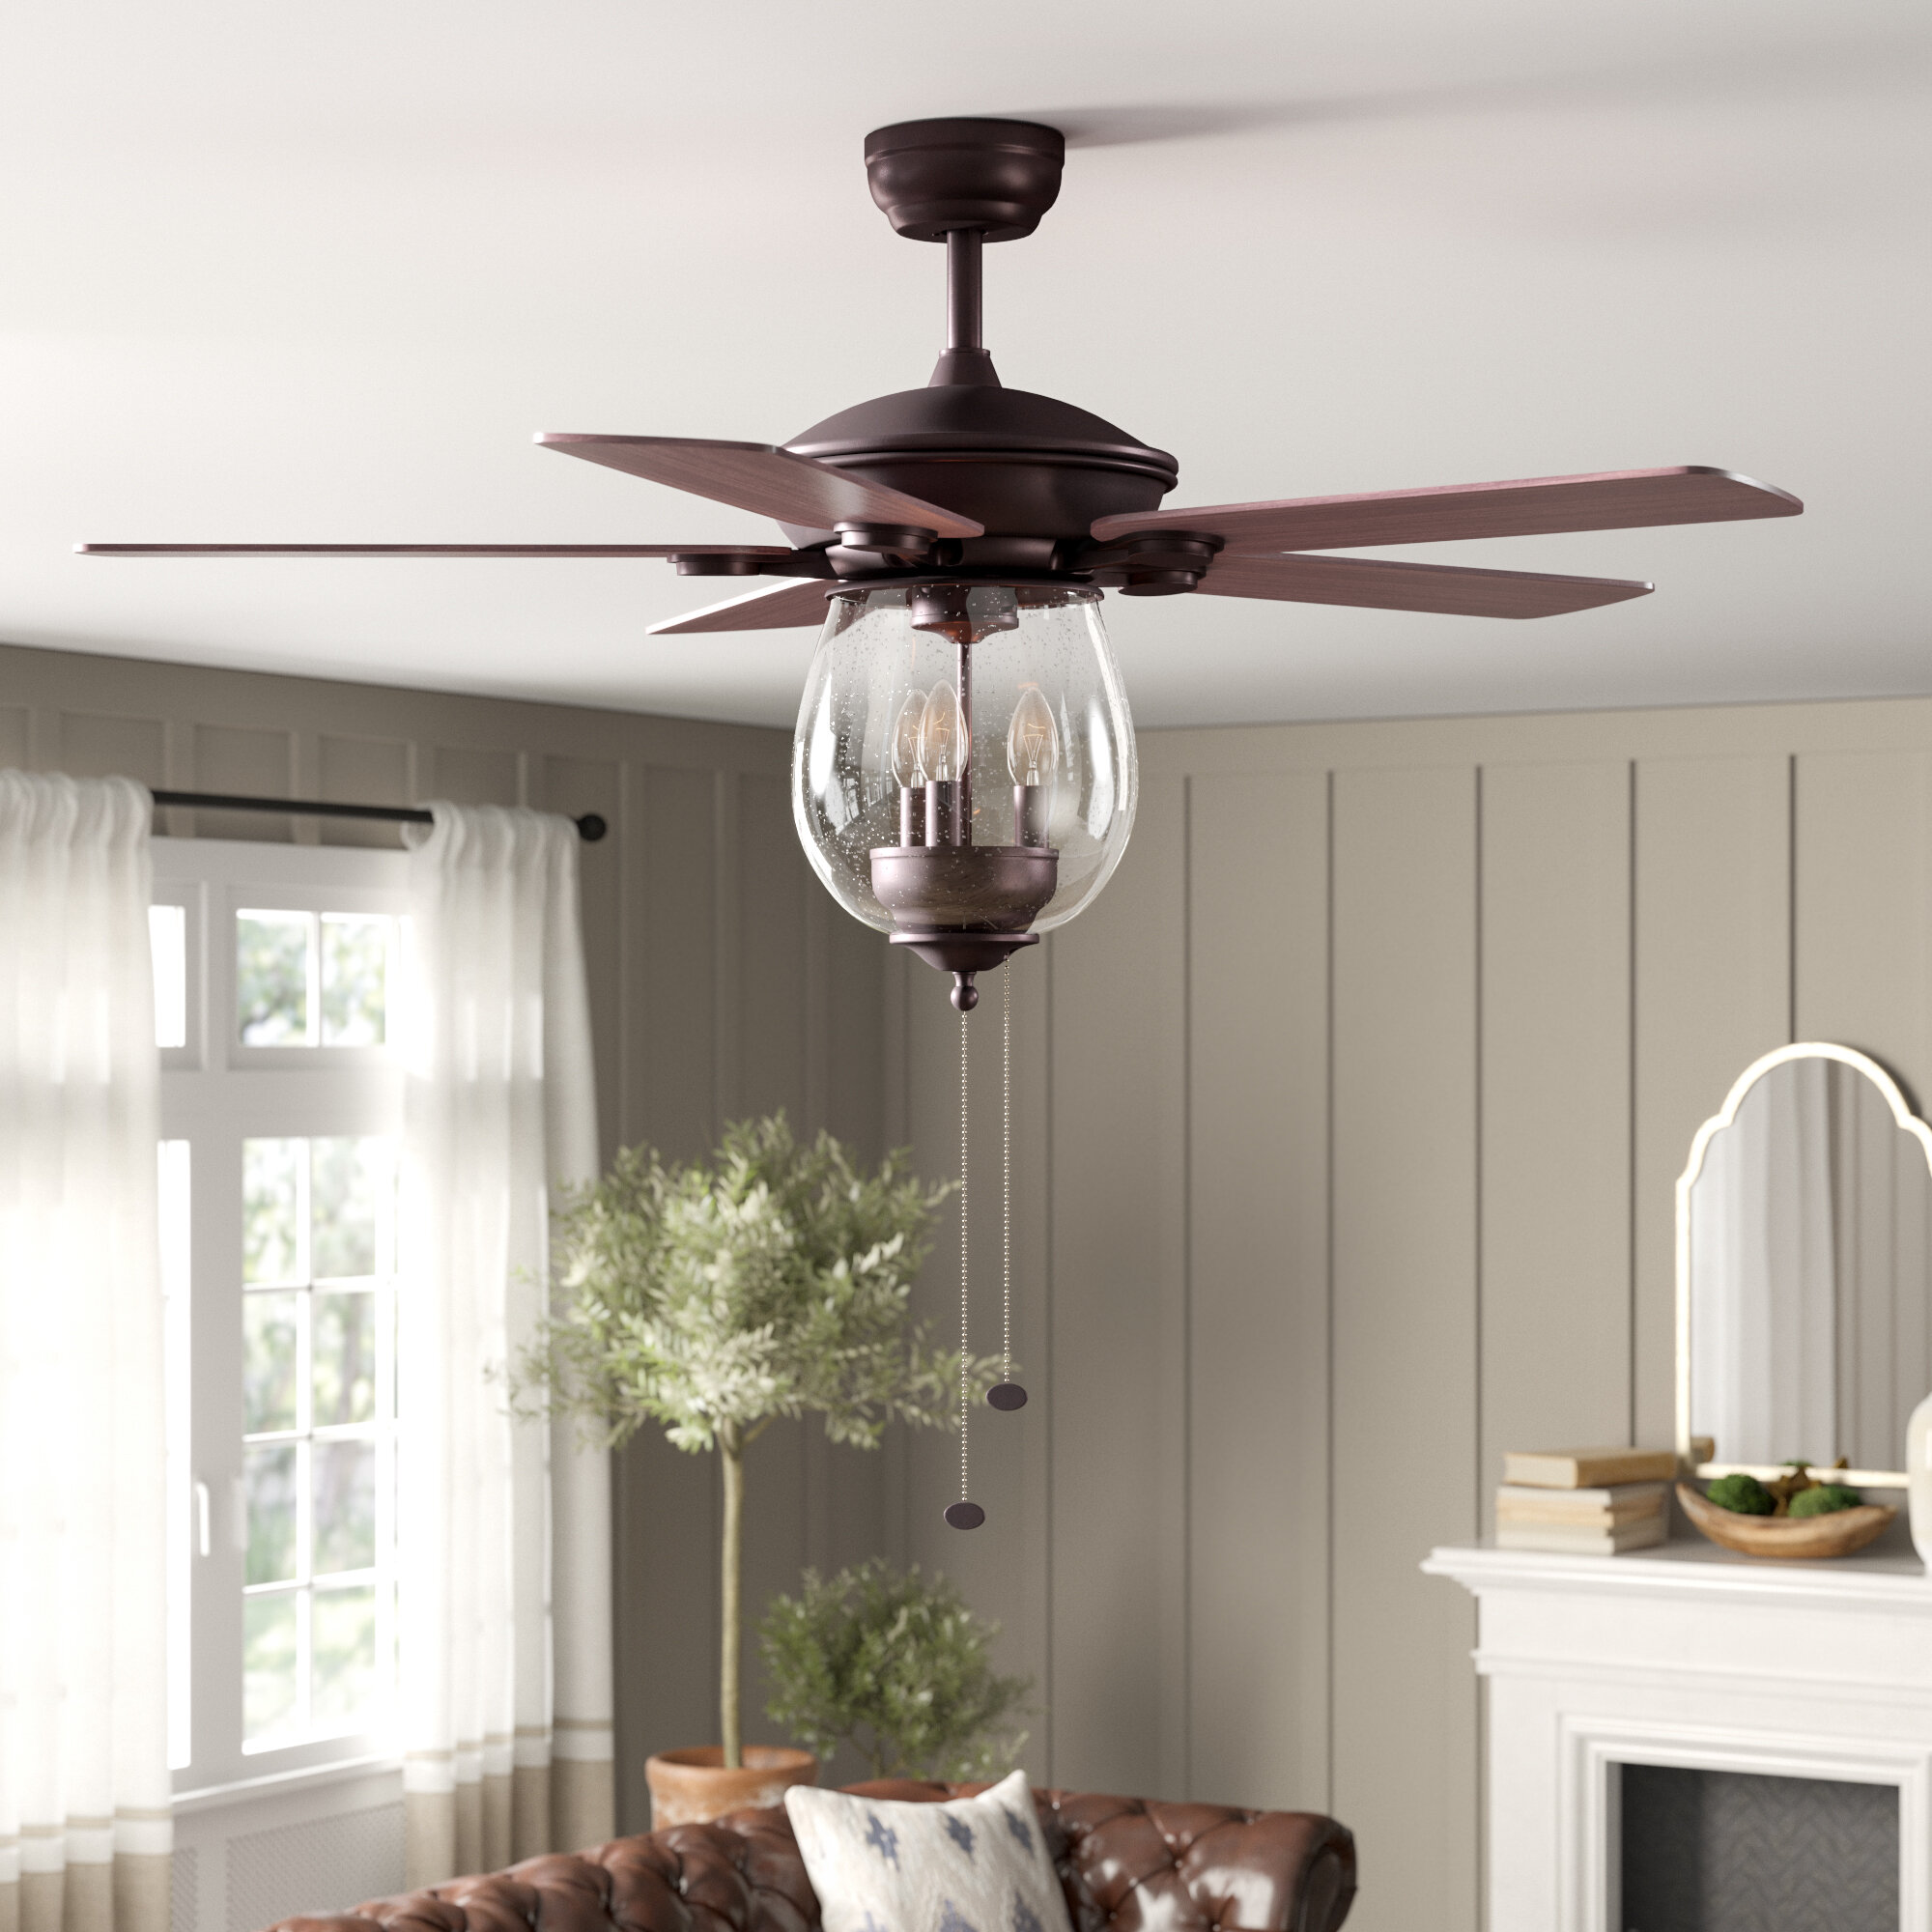 Birch Lane Heritage Rueben 5 Blade Ceiling Fan Light Kit